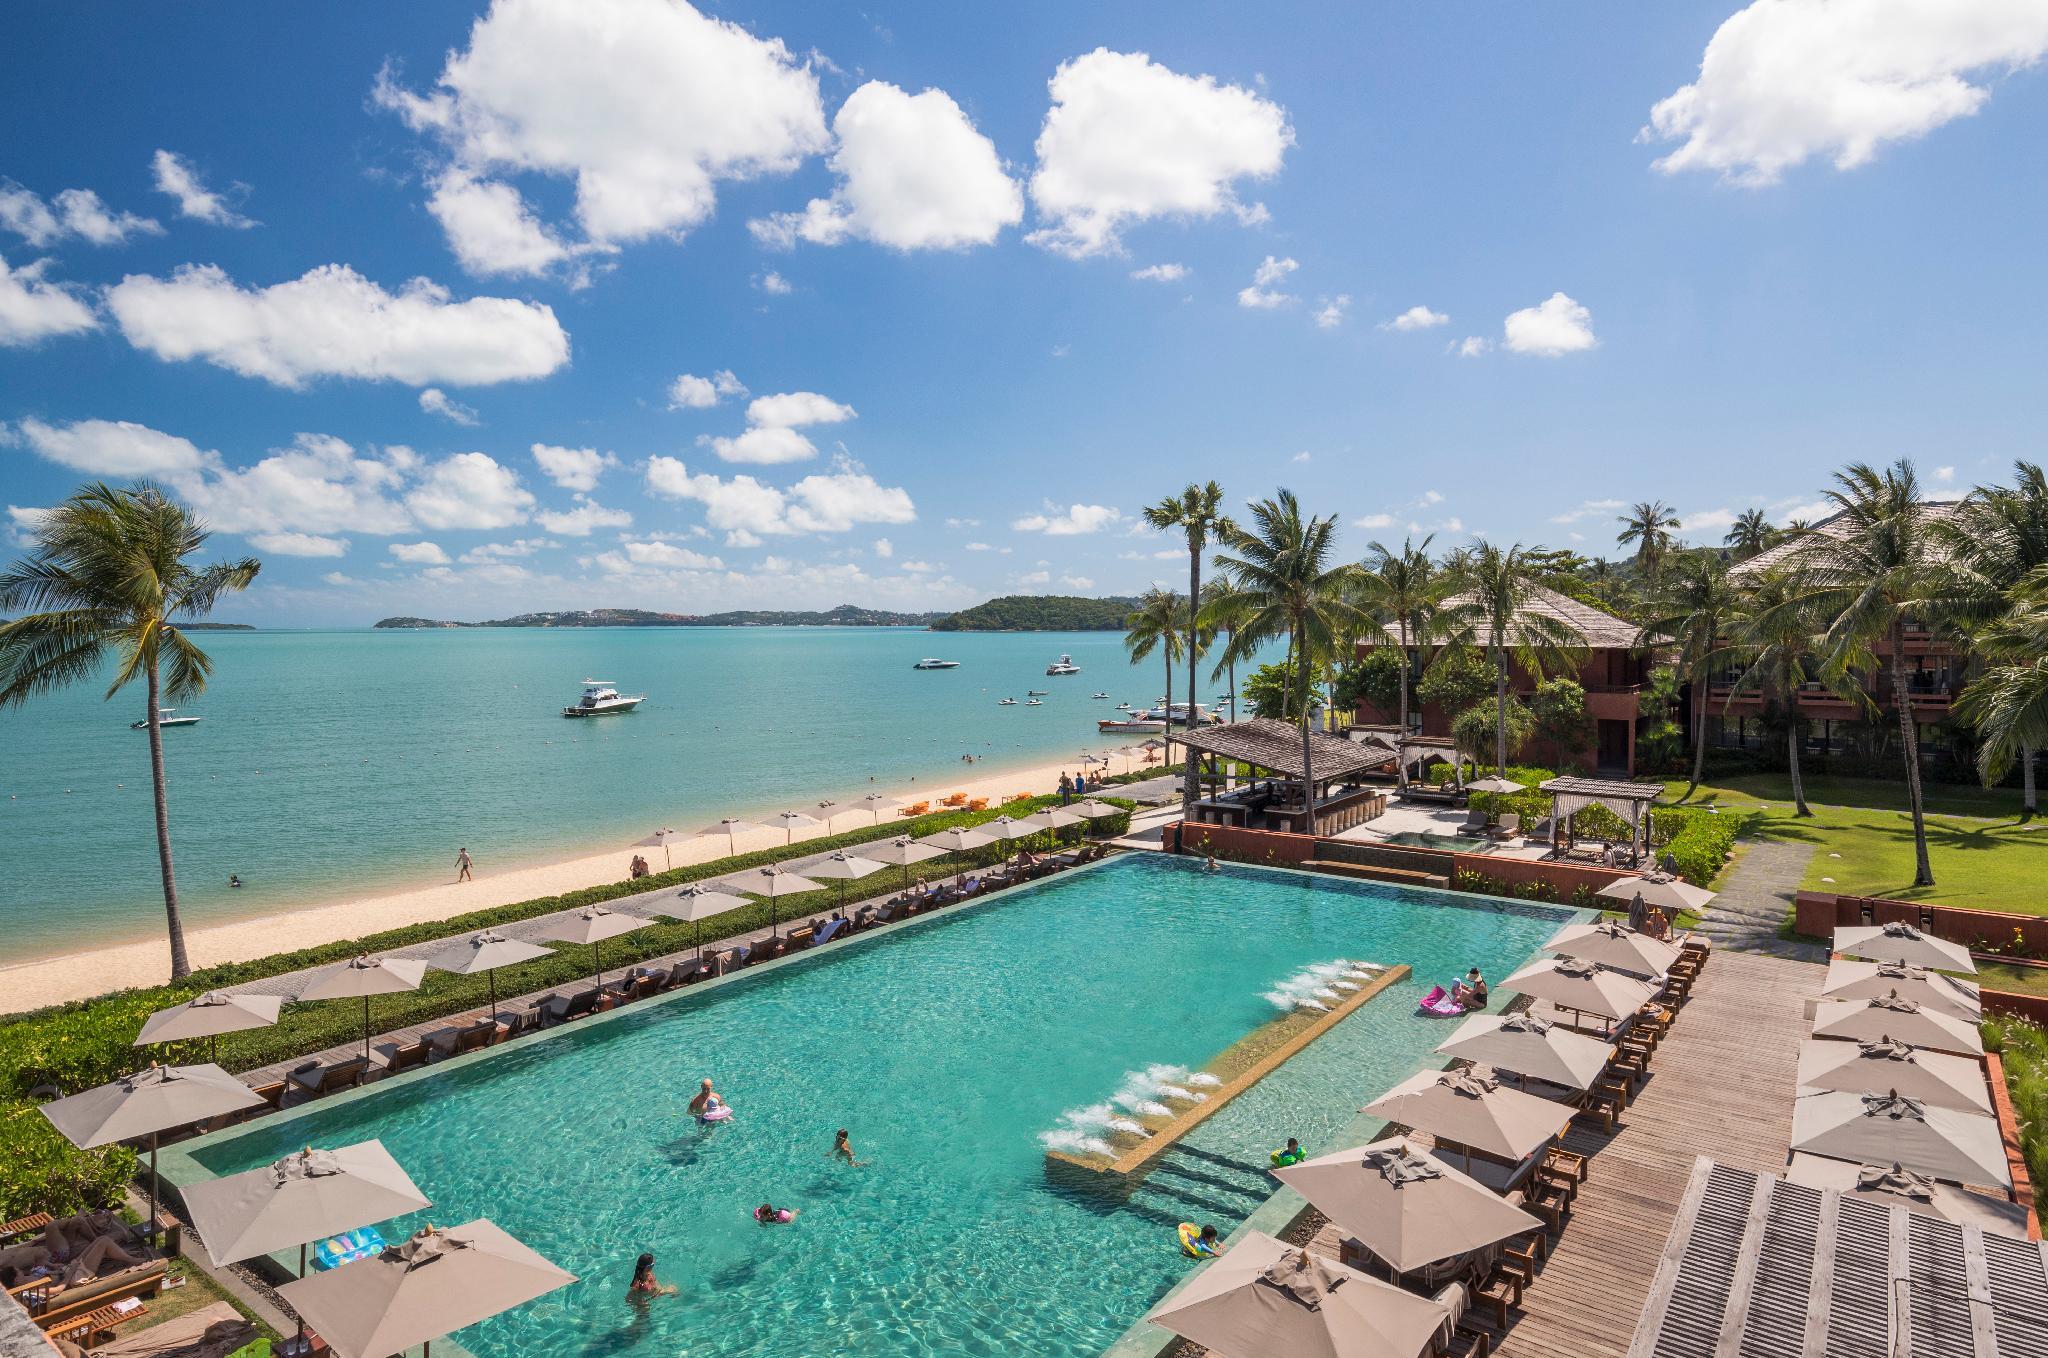 Hansar Samui Resort & Spa - Top 10 Best Luxury Hotels And Resorts in Koh Samui